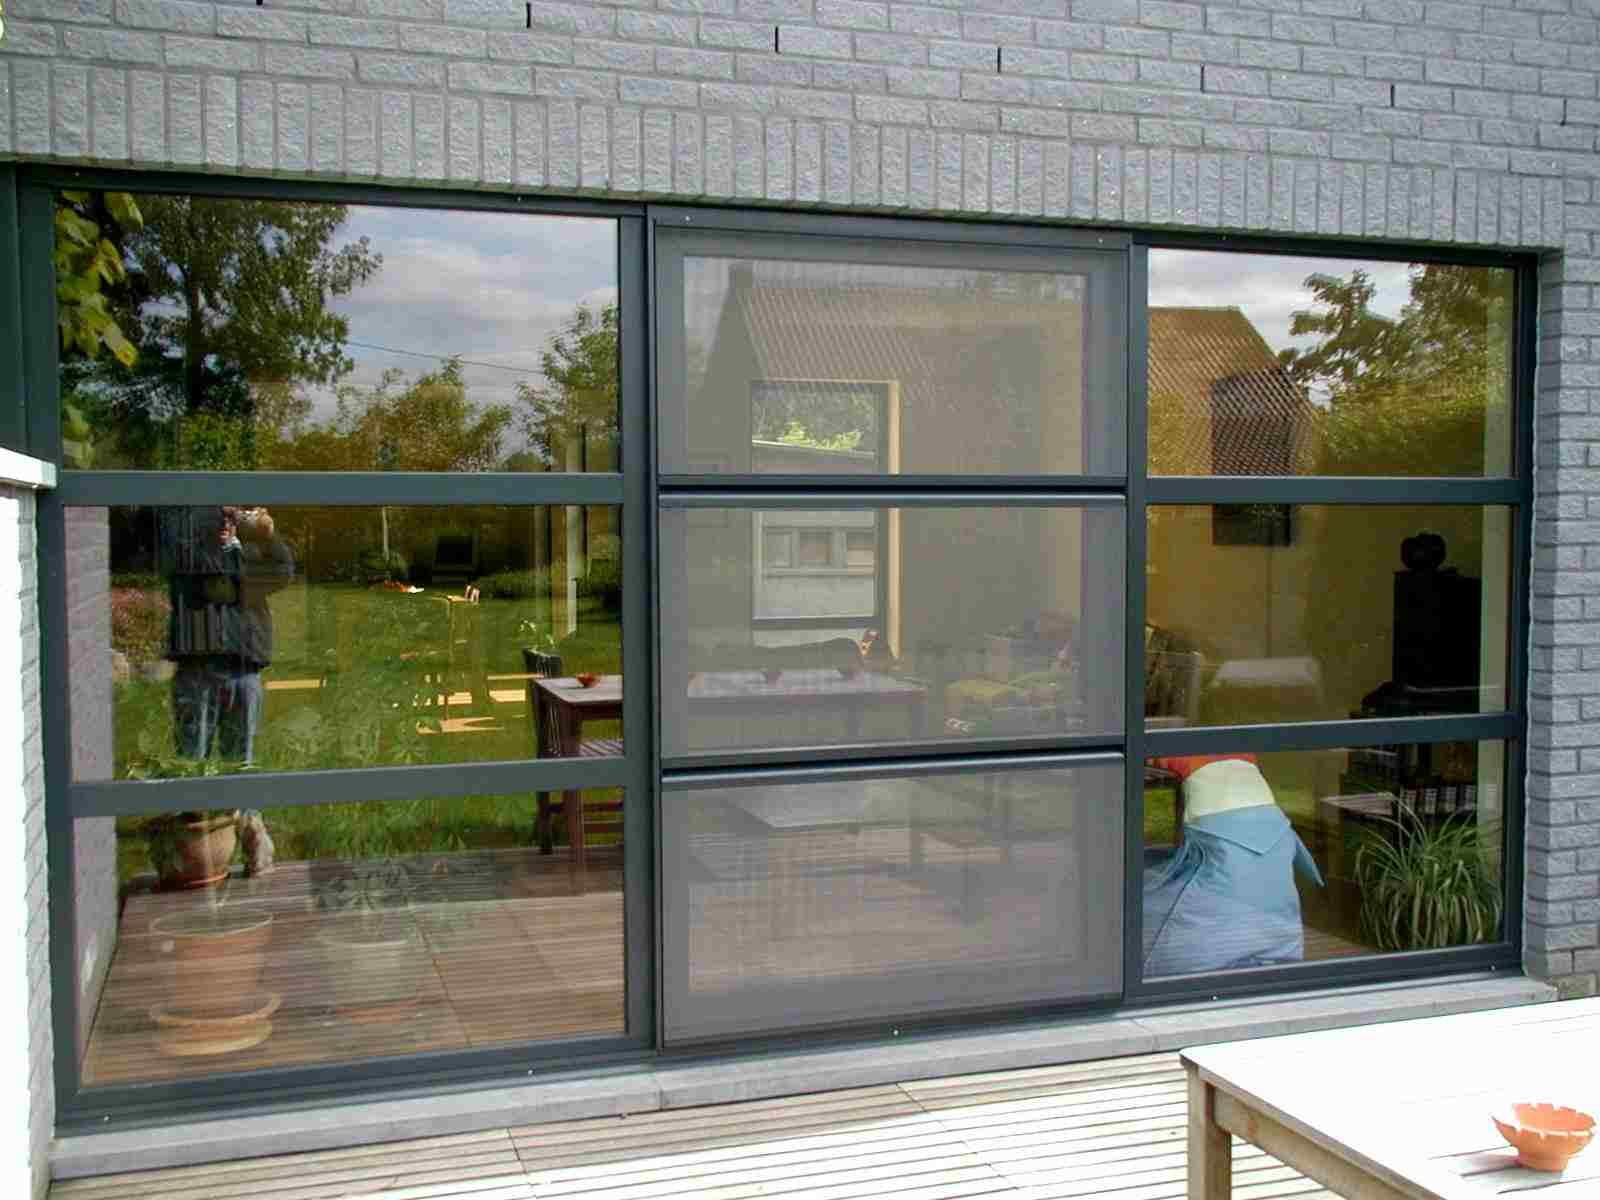 vliegenramen vliegendeuren alu windows. Black Bedroom Furniture Sets. Home Design Ideas